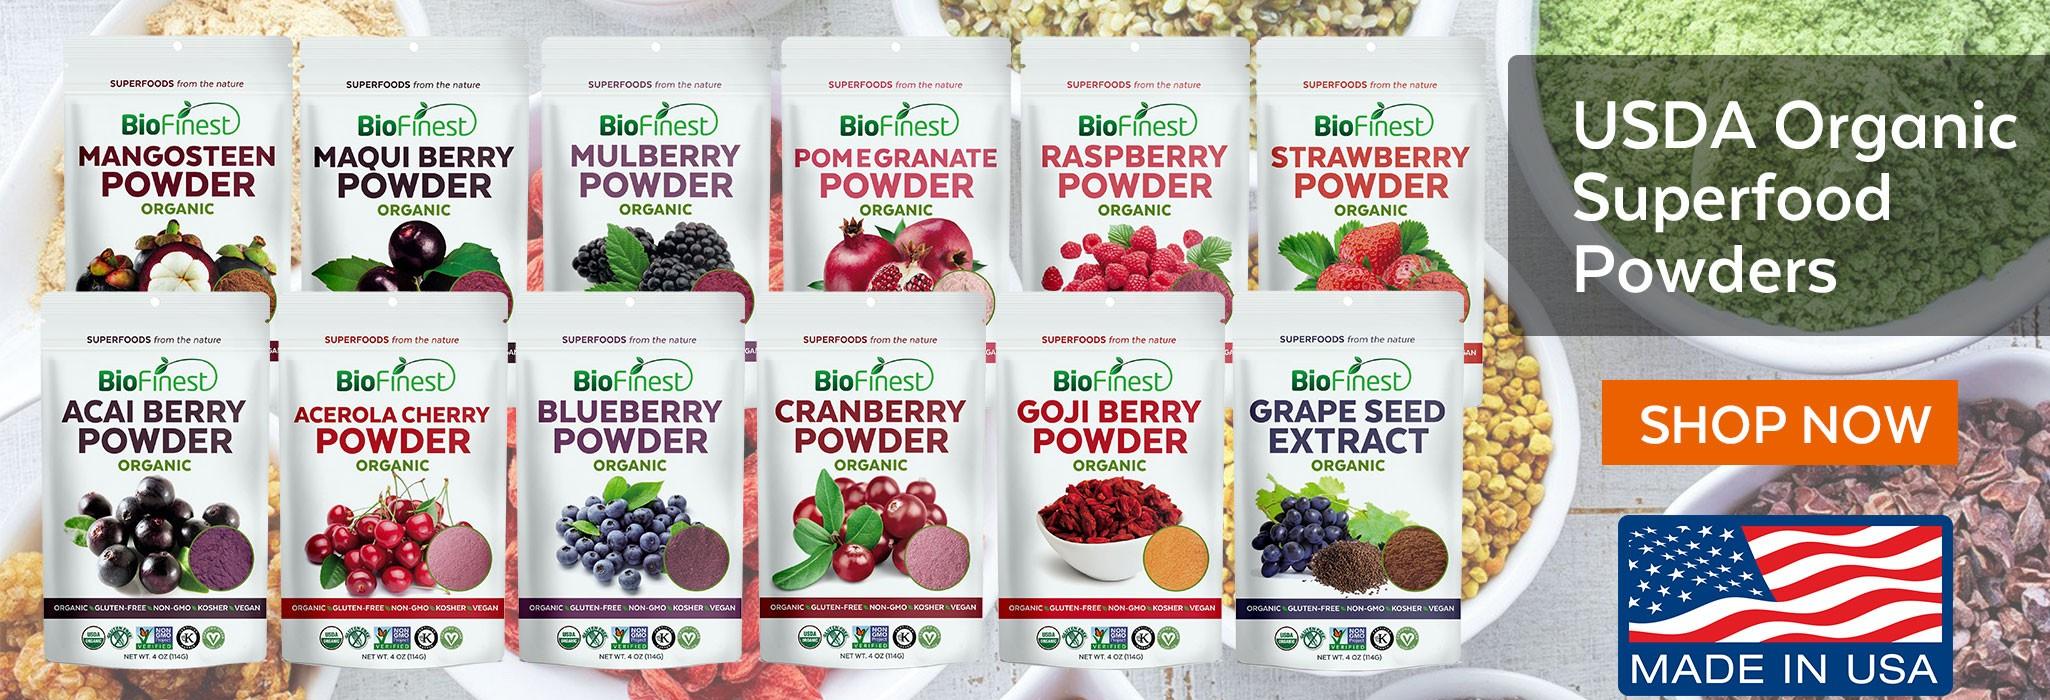 Biofinest 100% Organic Superfood Powders